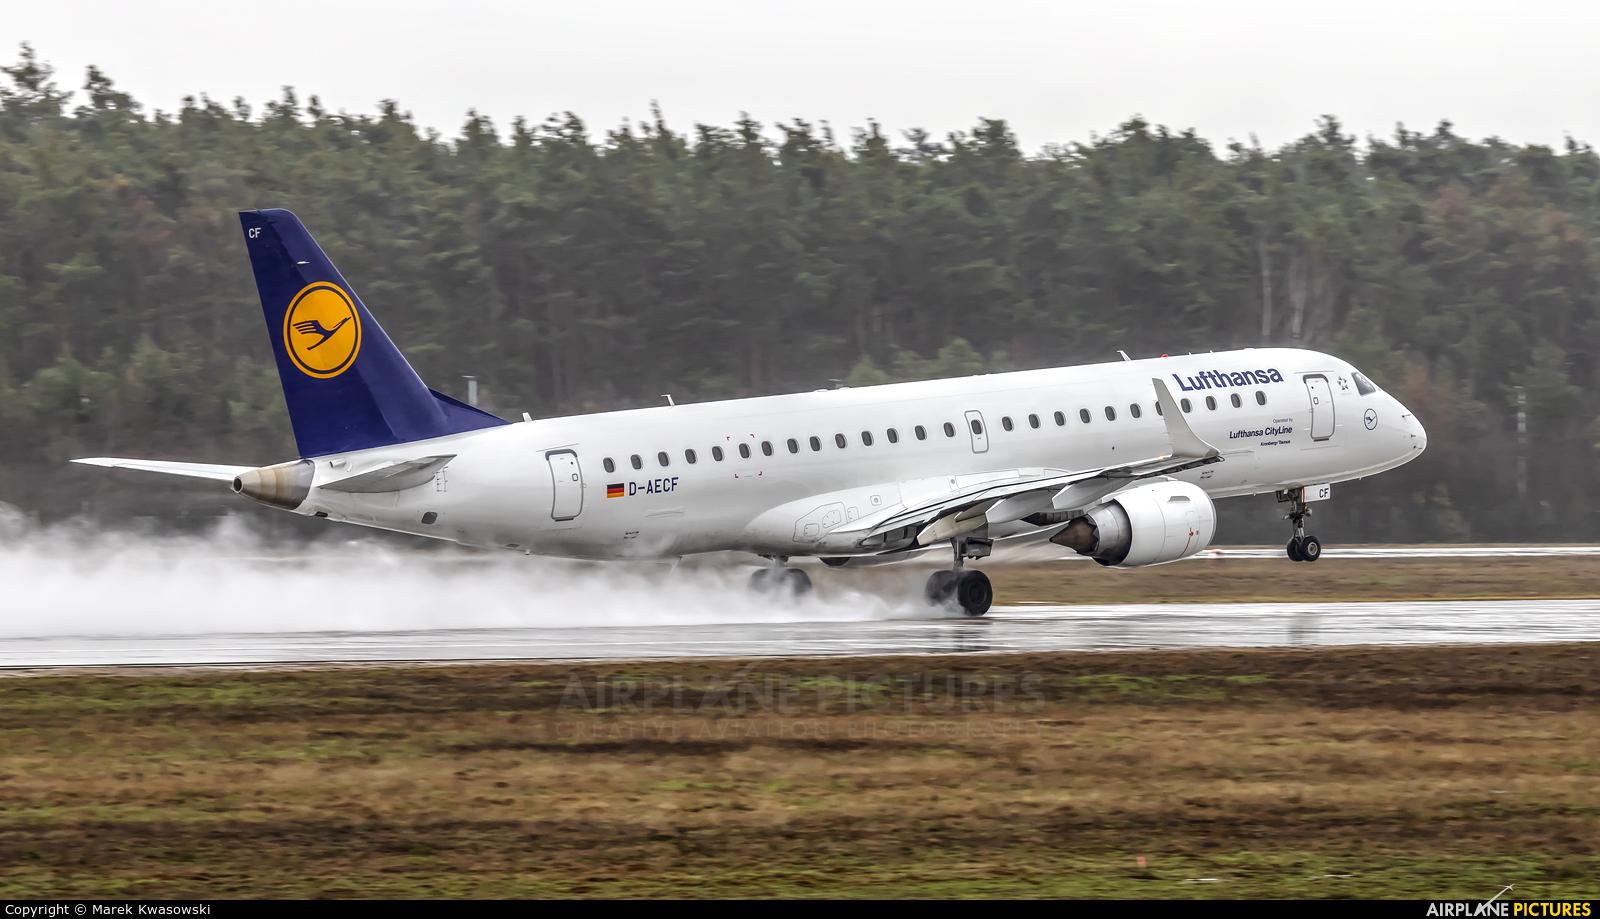 Lufthansa Regional - CityLine D-AECF aircraft at Frankfurt